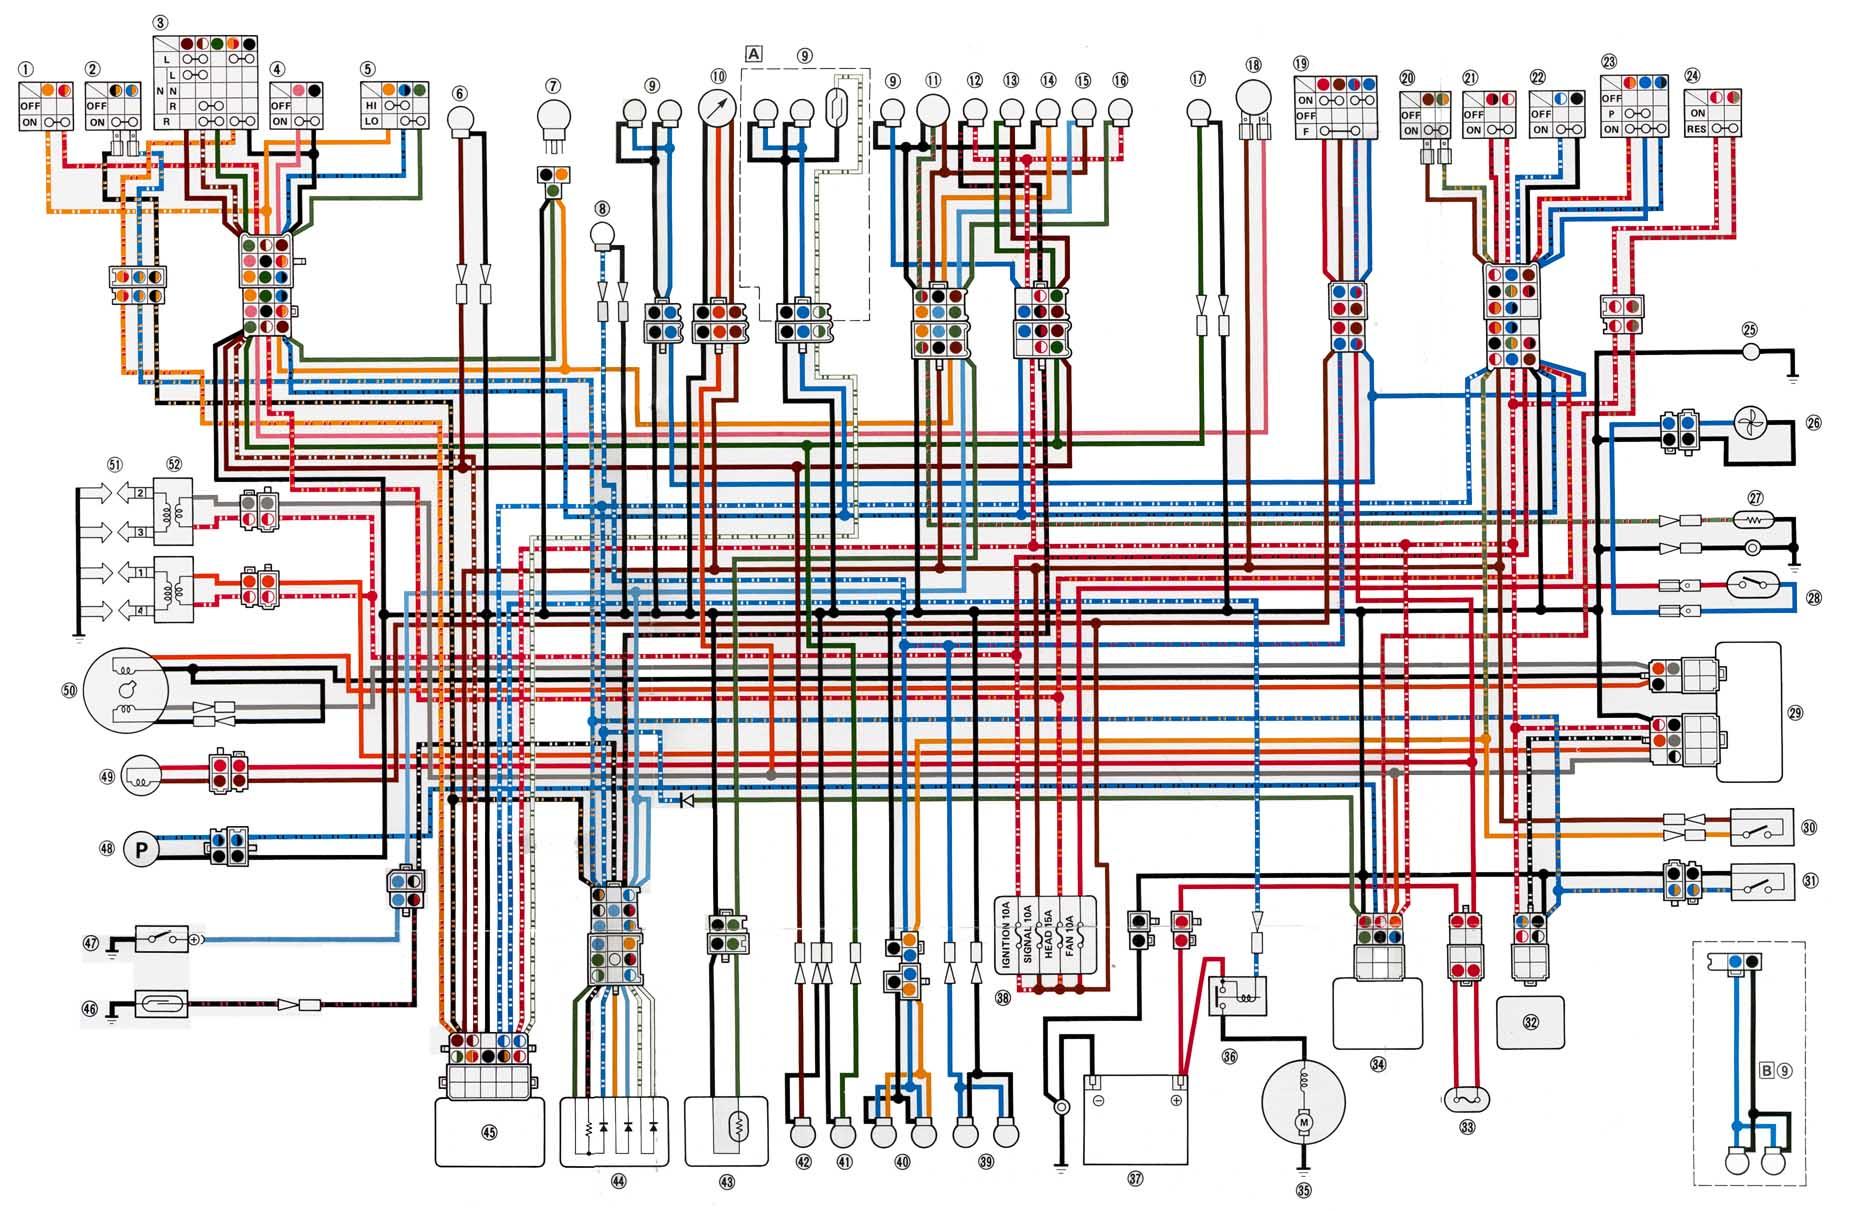 yamaha srx wiring diagram | wiring diagram data formal  floretina.com